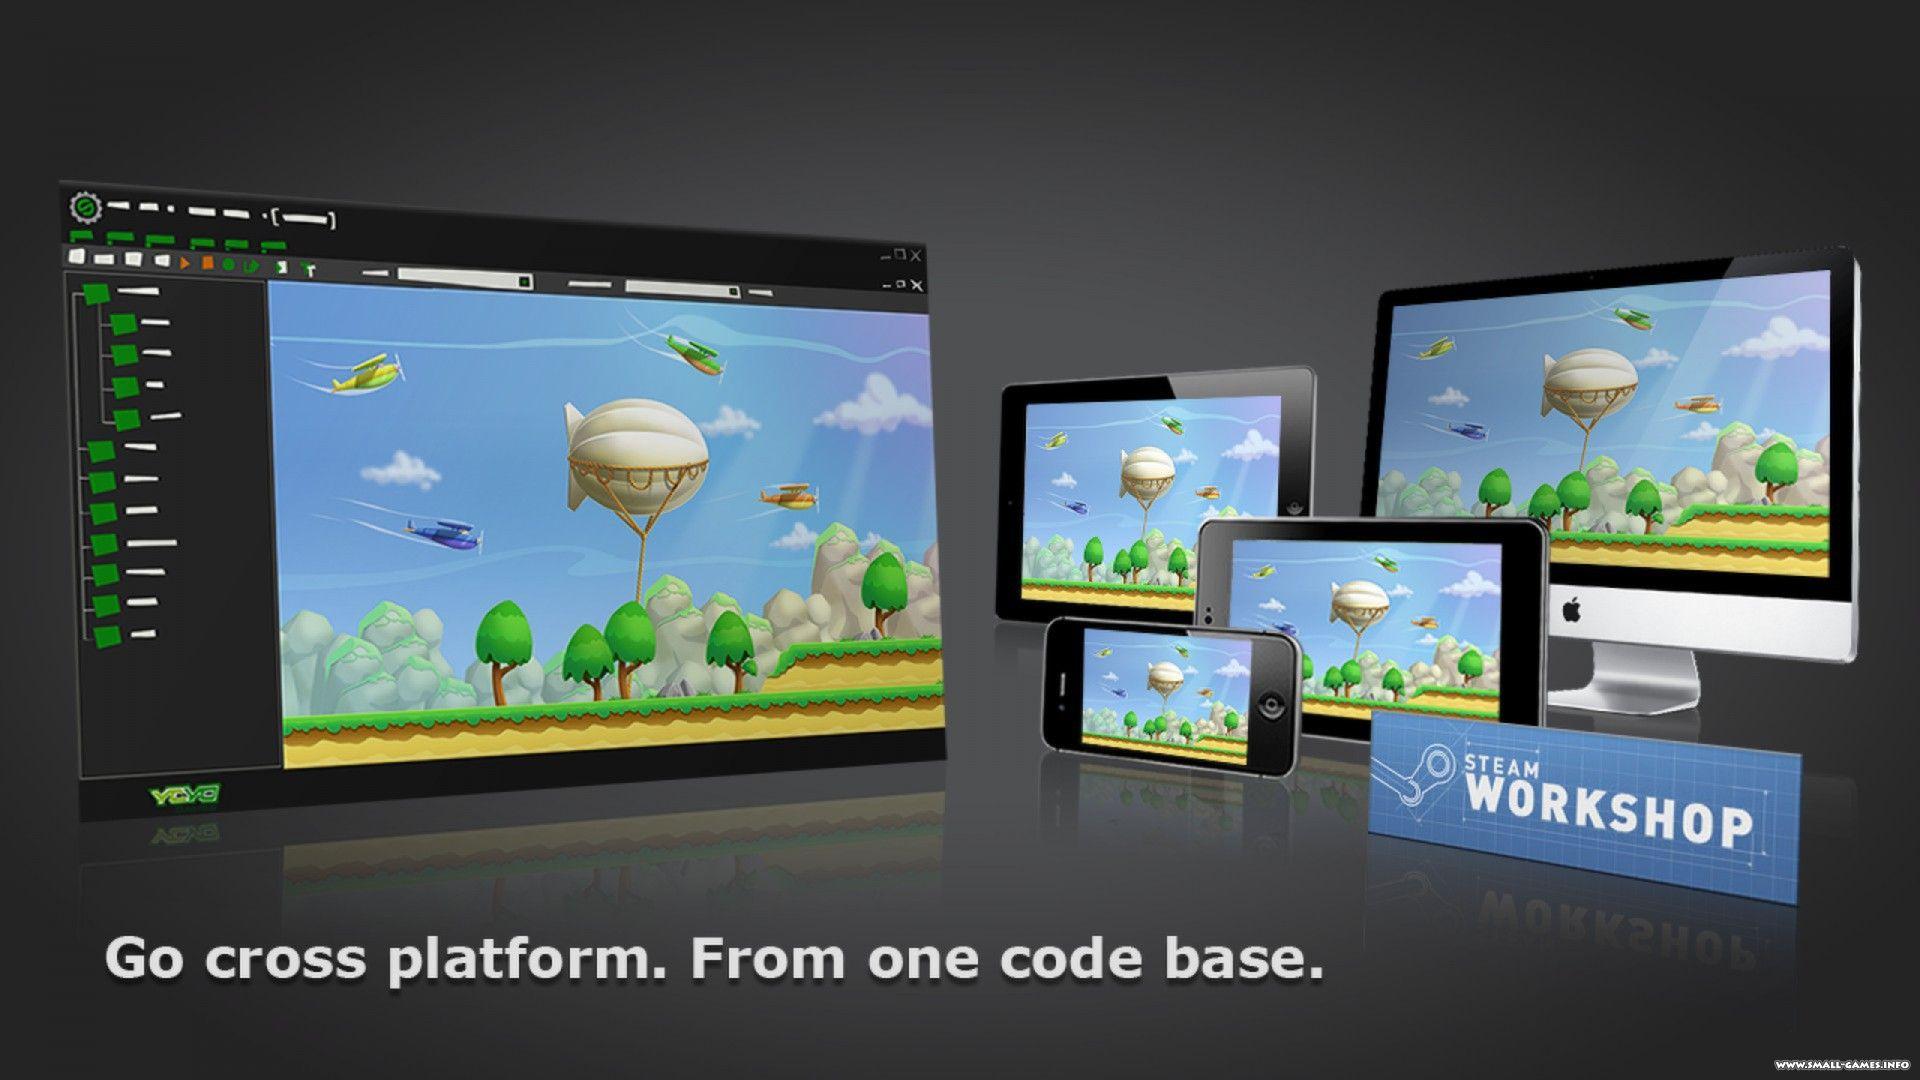 http://ustaderslik.com/resim/ders/gamemaker_studio_3.jpg